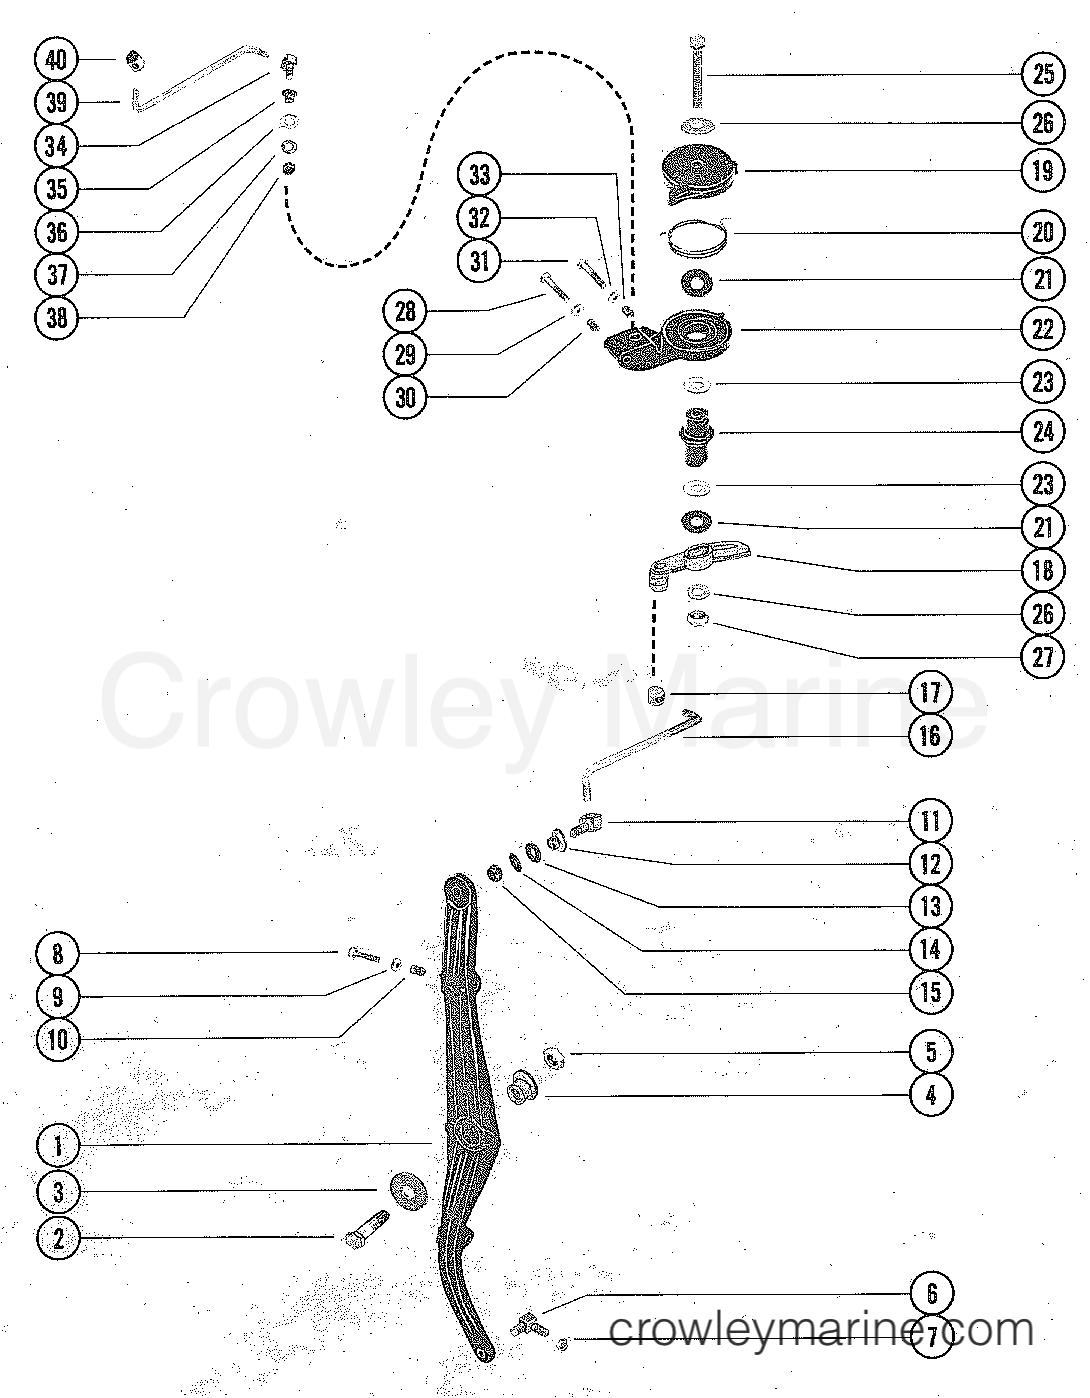 serial throttle 6